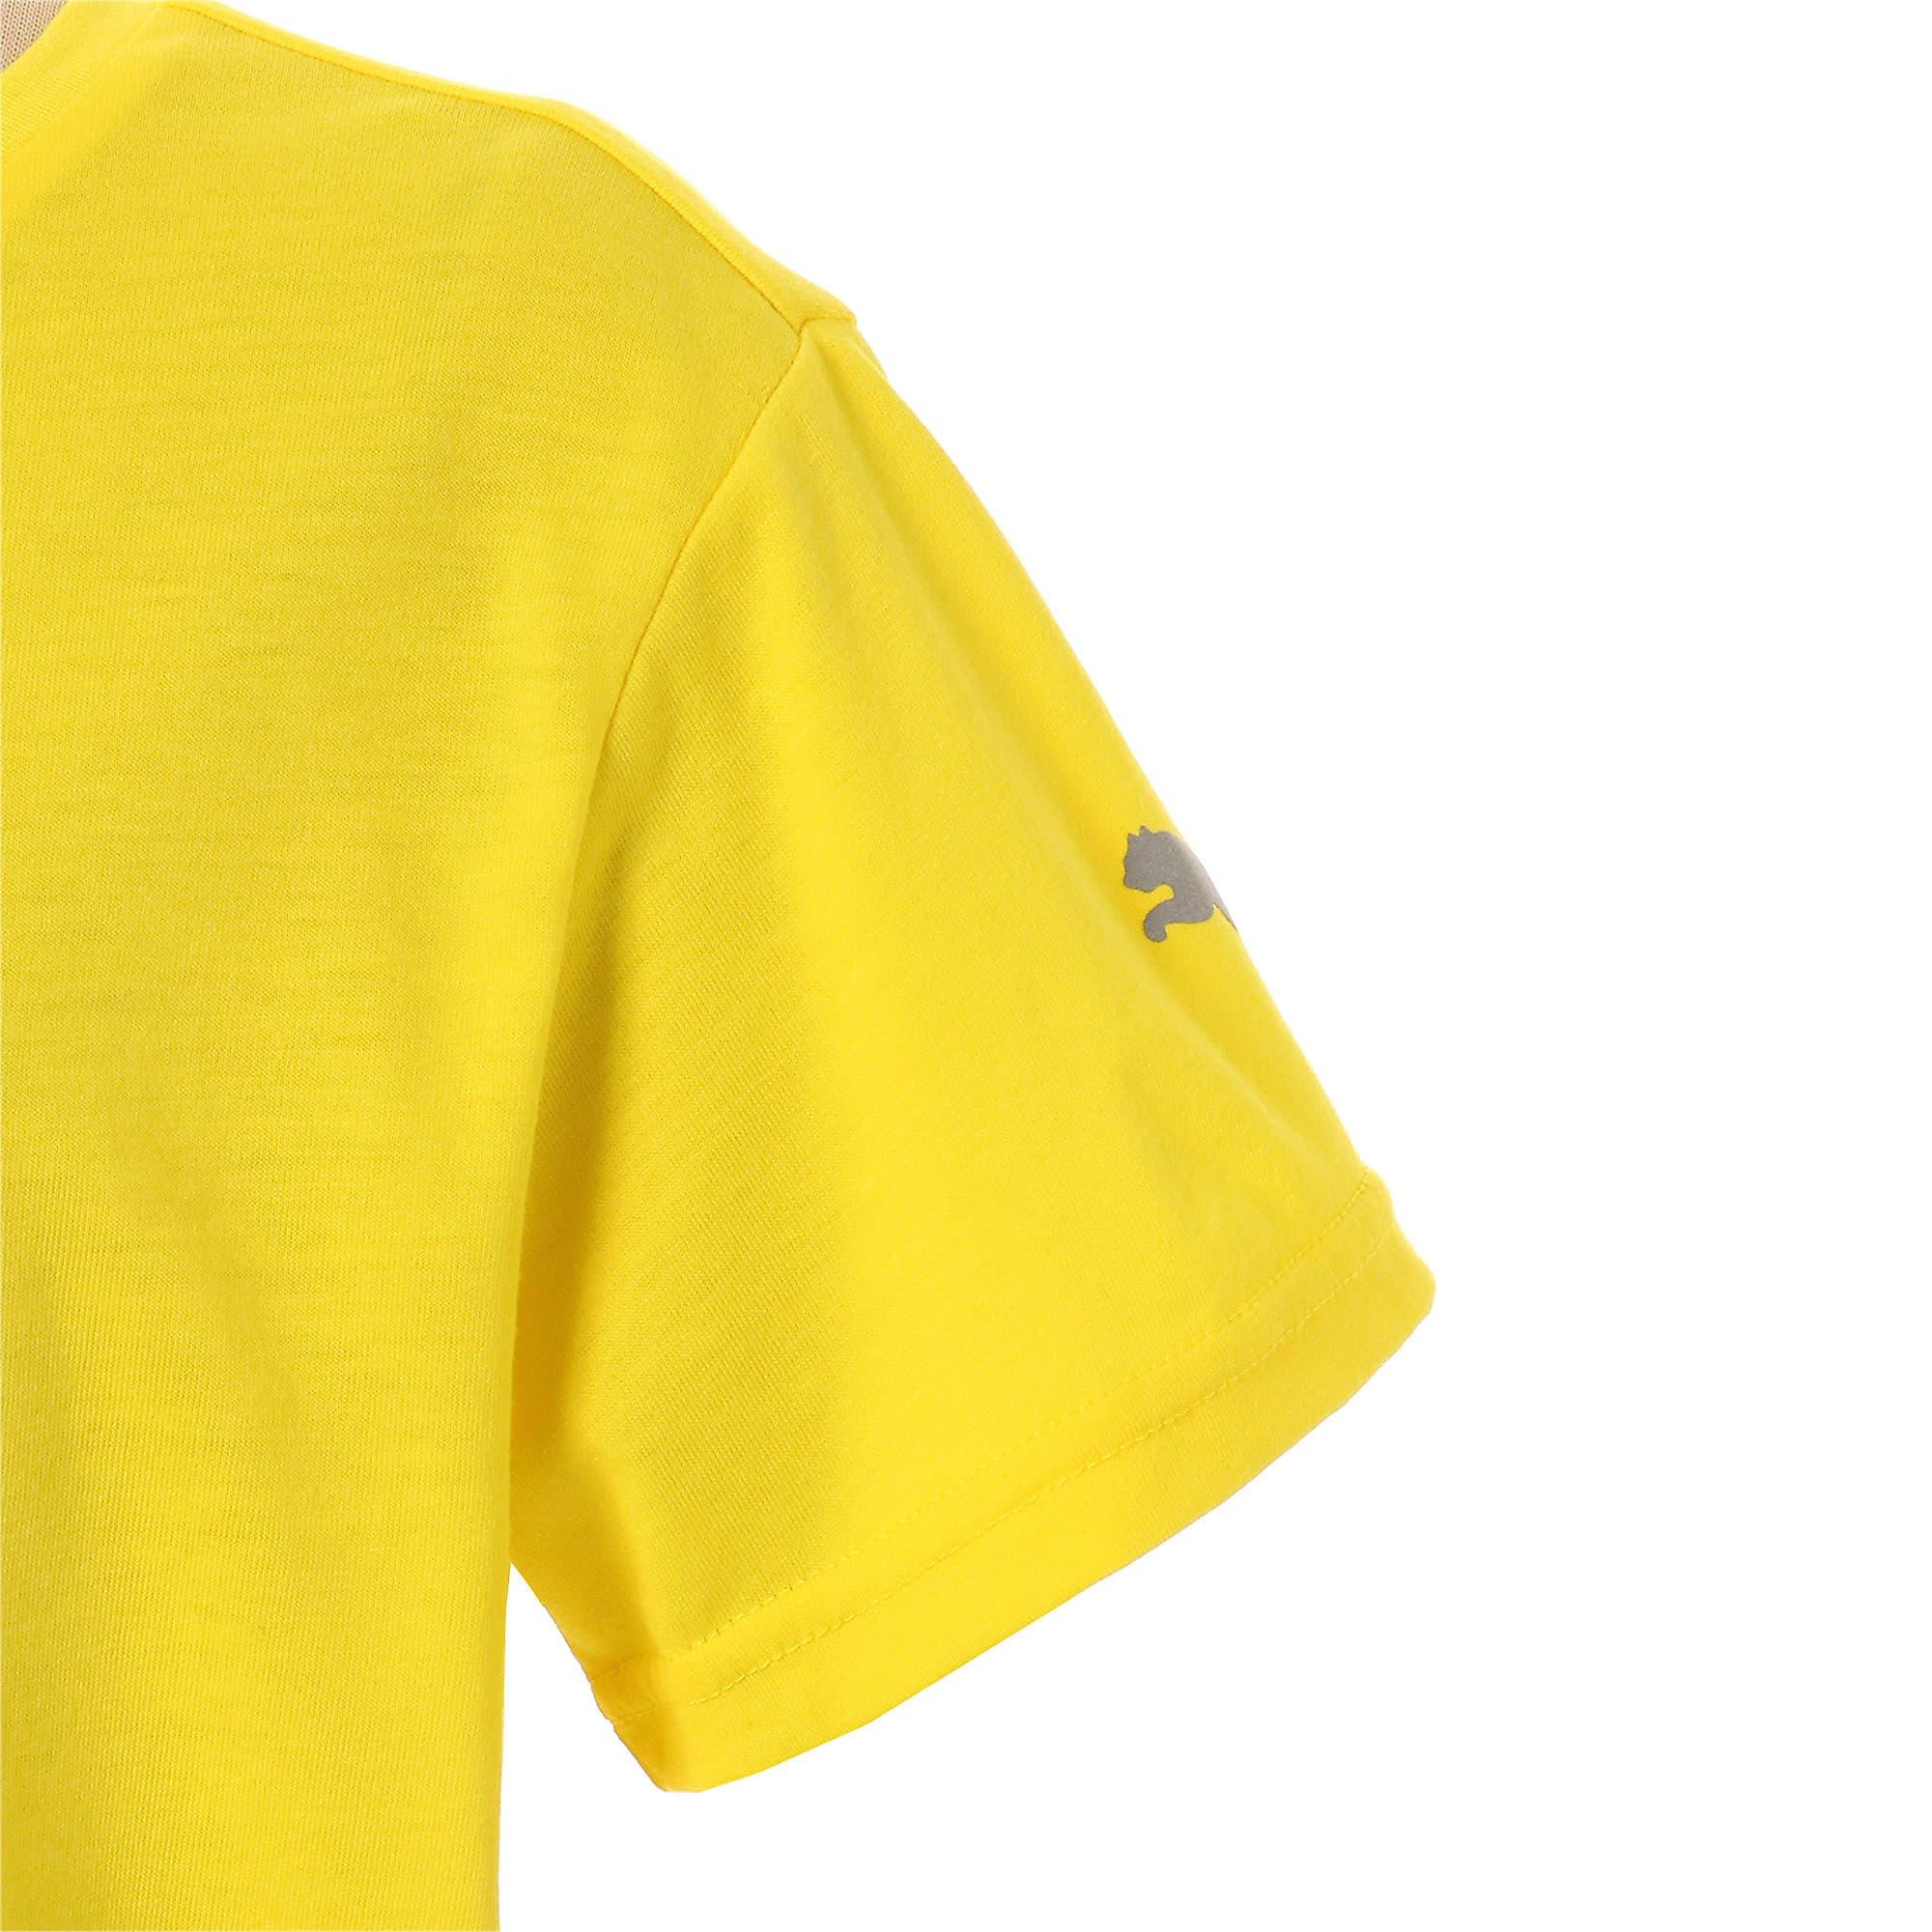 Thumbnail 5 of キッズ エナジー SS Tシャツ 半袖, Blazing Yellow, medium-JPN